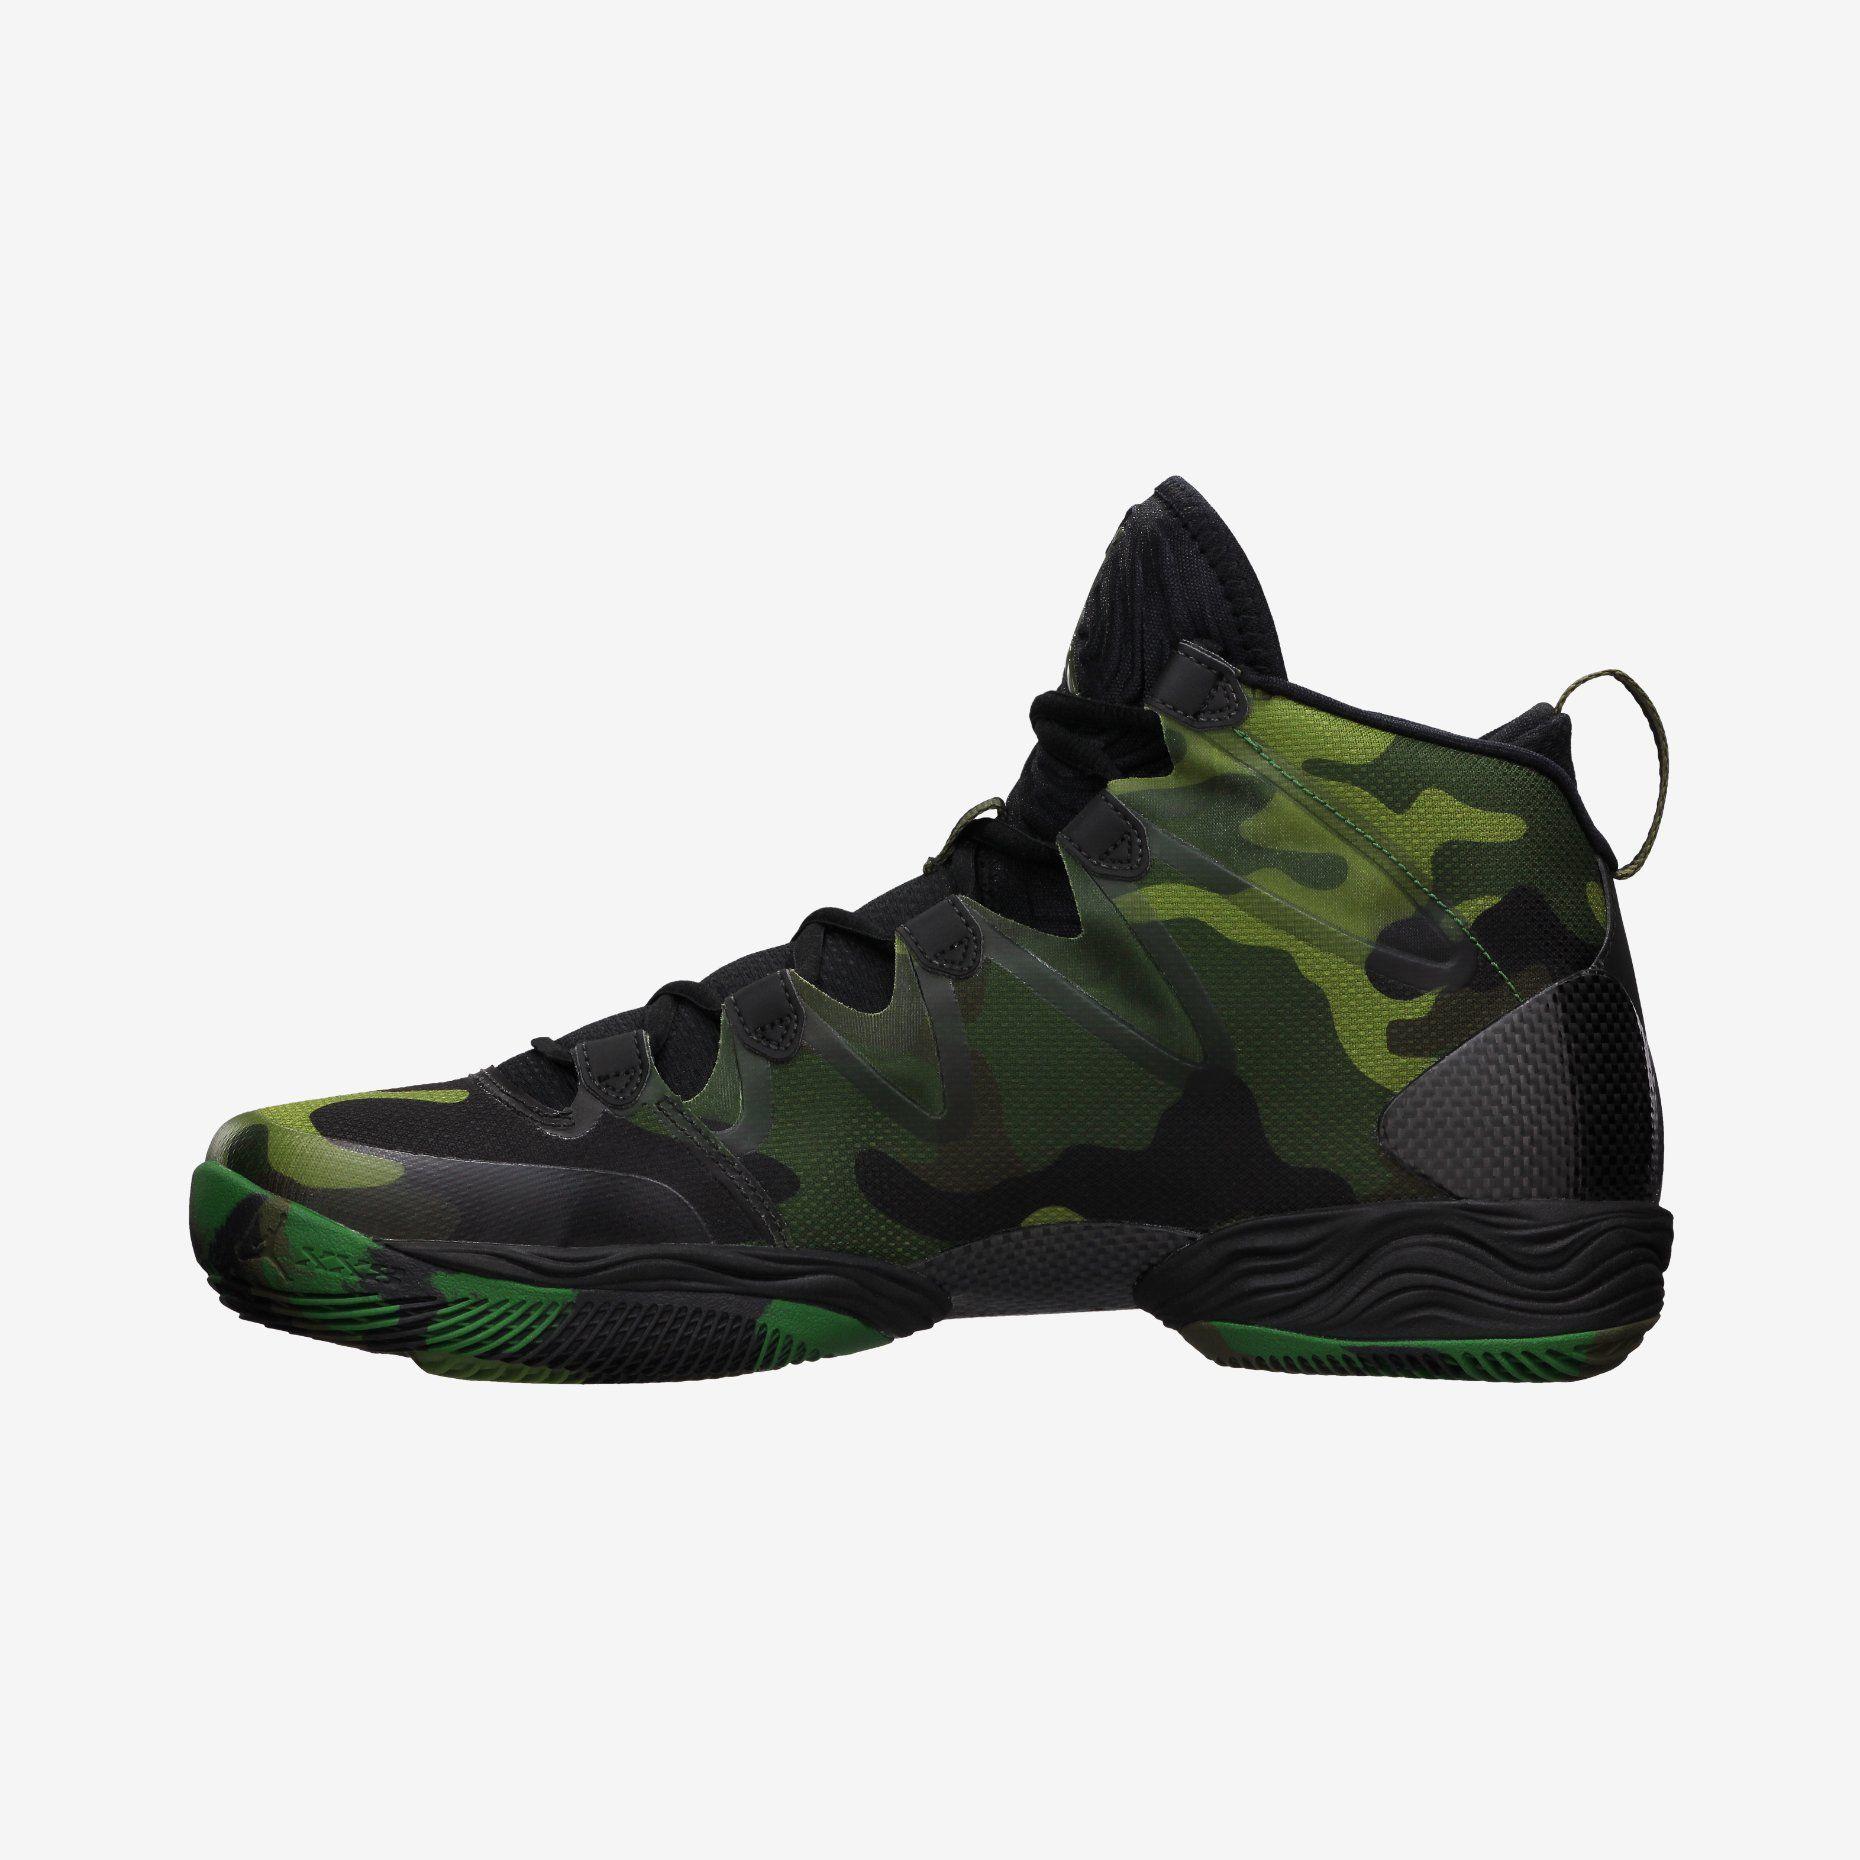 a7e7086431b0fe Air Jordan XX8 SE Men s Basketball Shoe